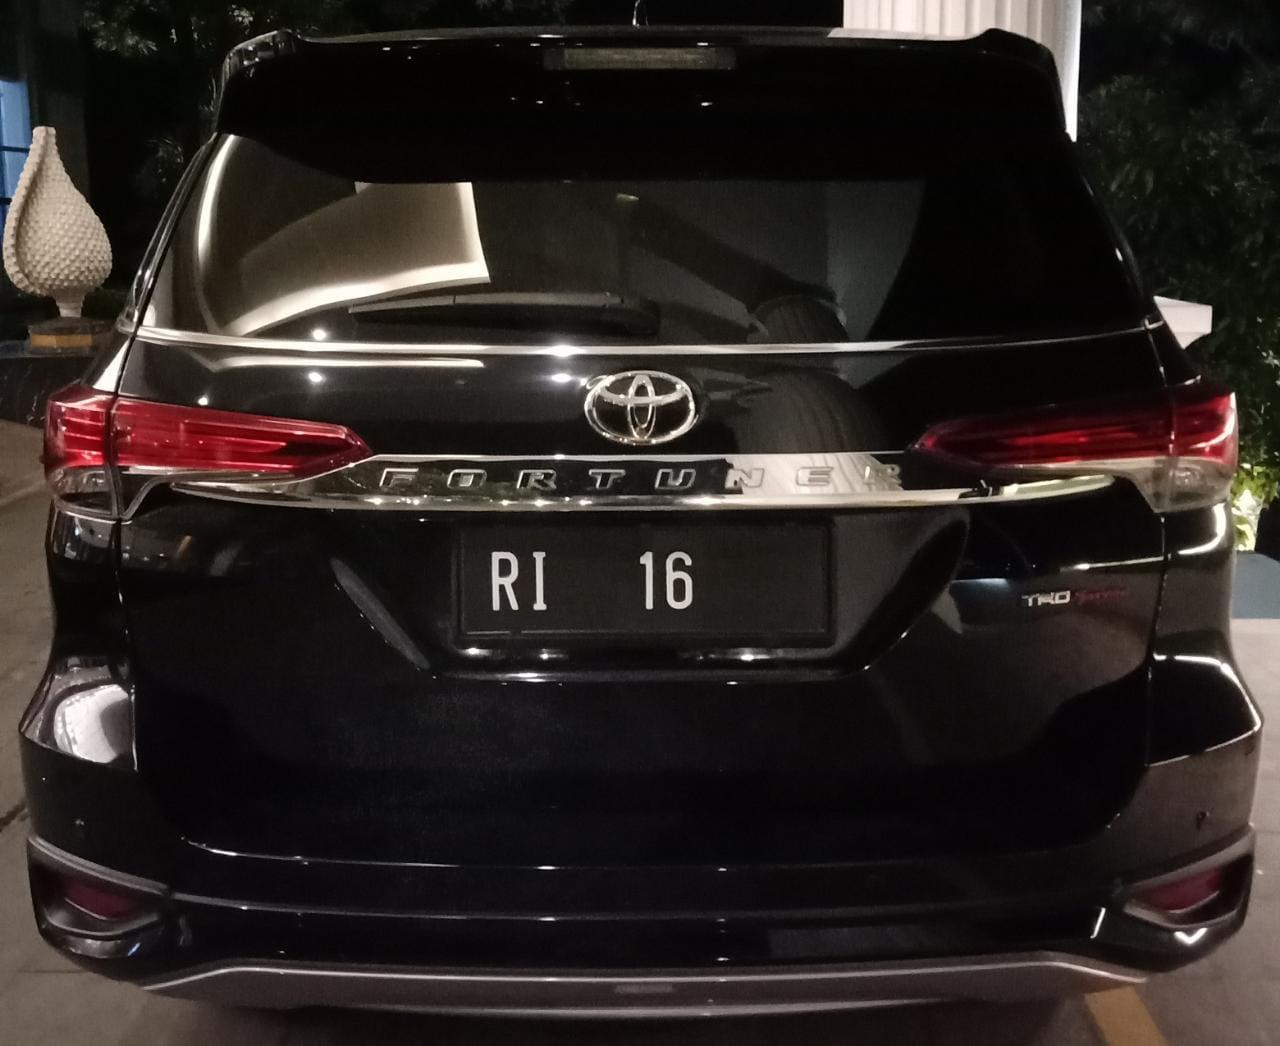 Rental Mobil Tanjung Pinang CV. Aulia Rent Car & Transport